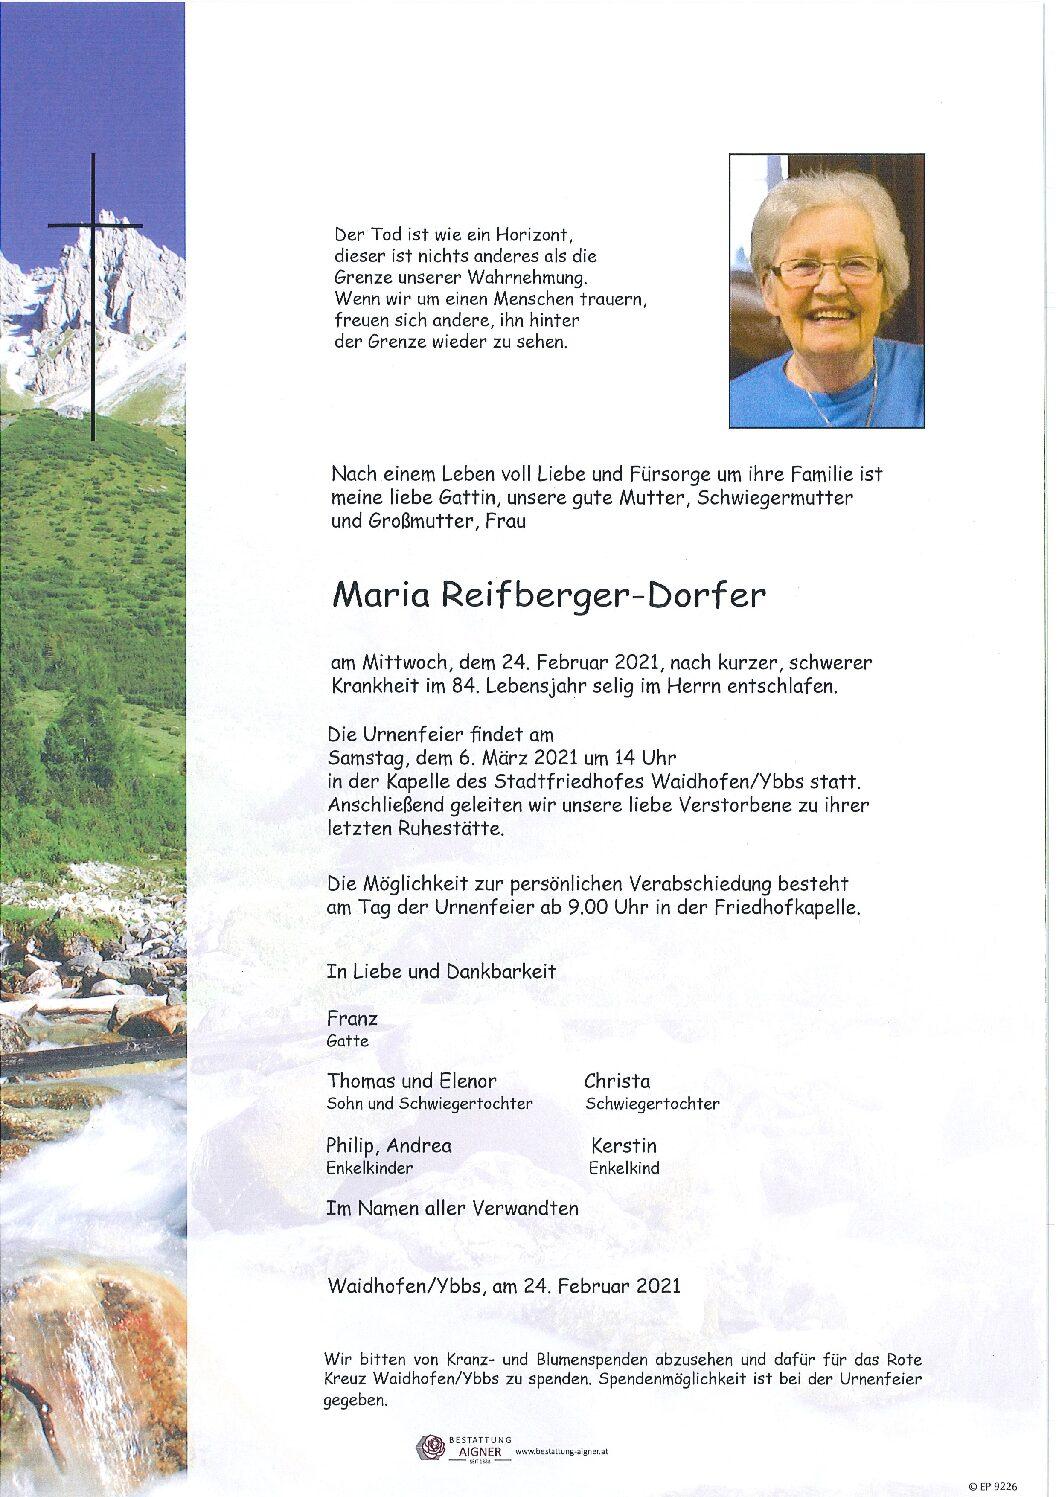 Maria Reifberger-Dorfer